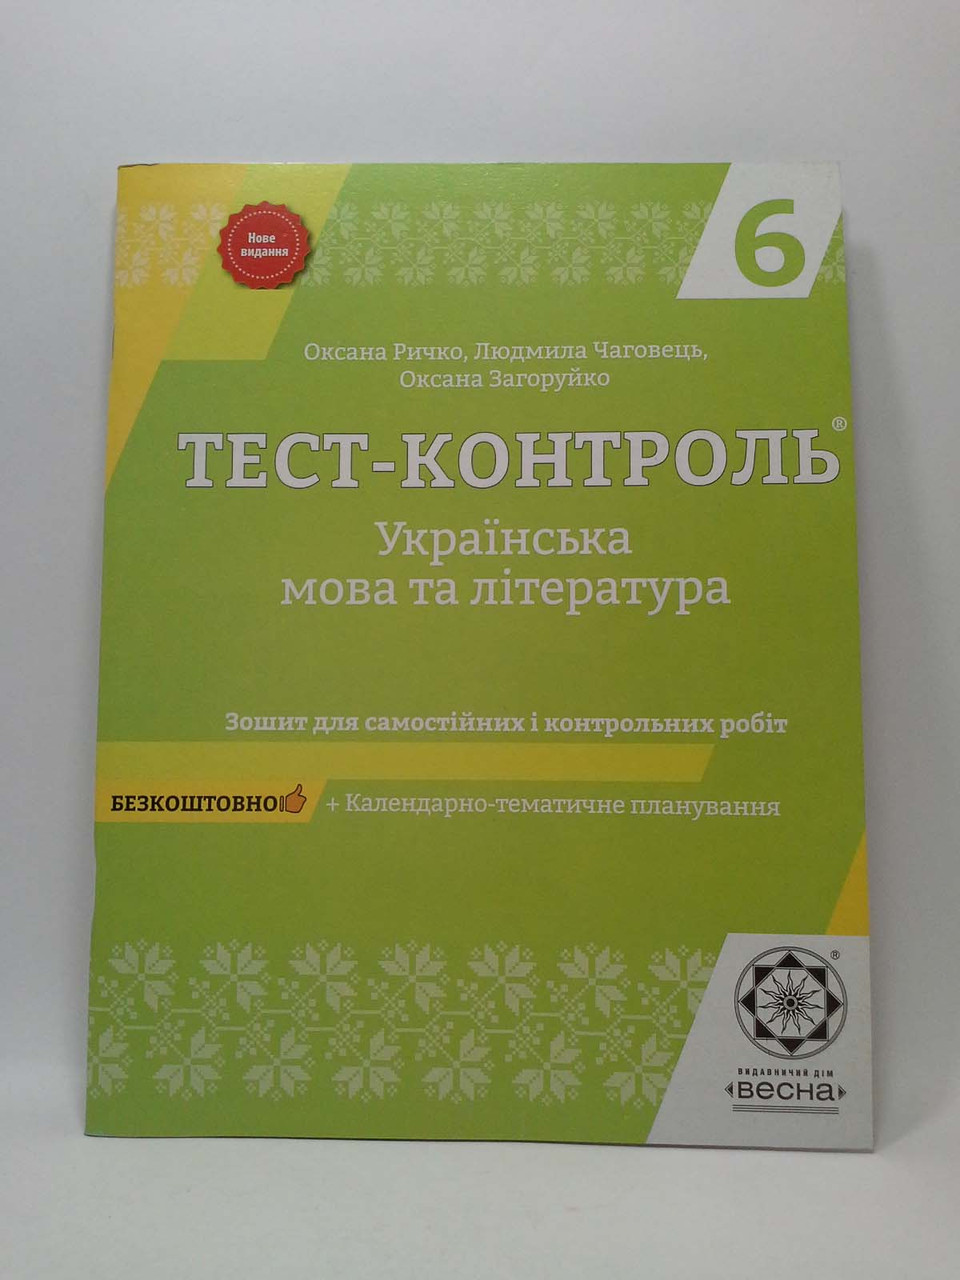 Весна Тест контроль Українська мова 6 клас Українська література 6 клас